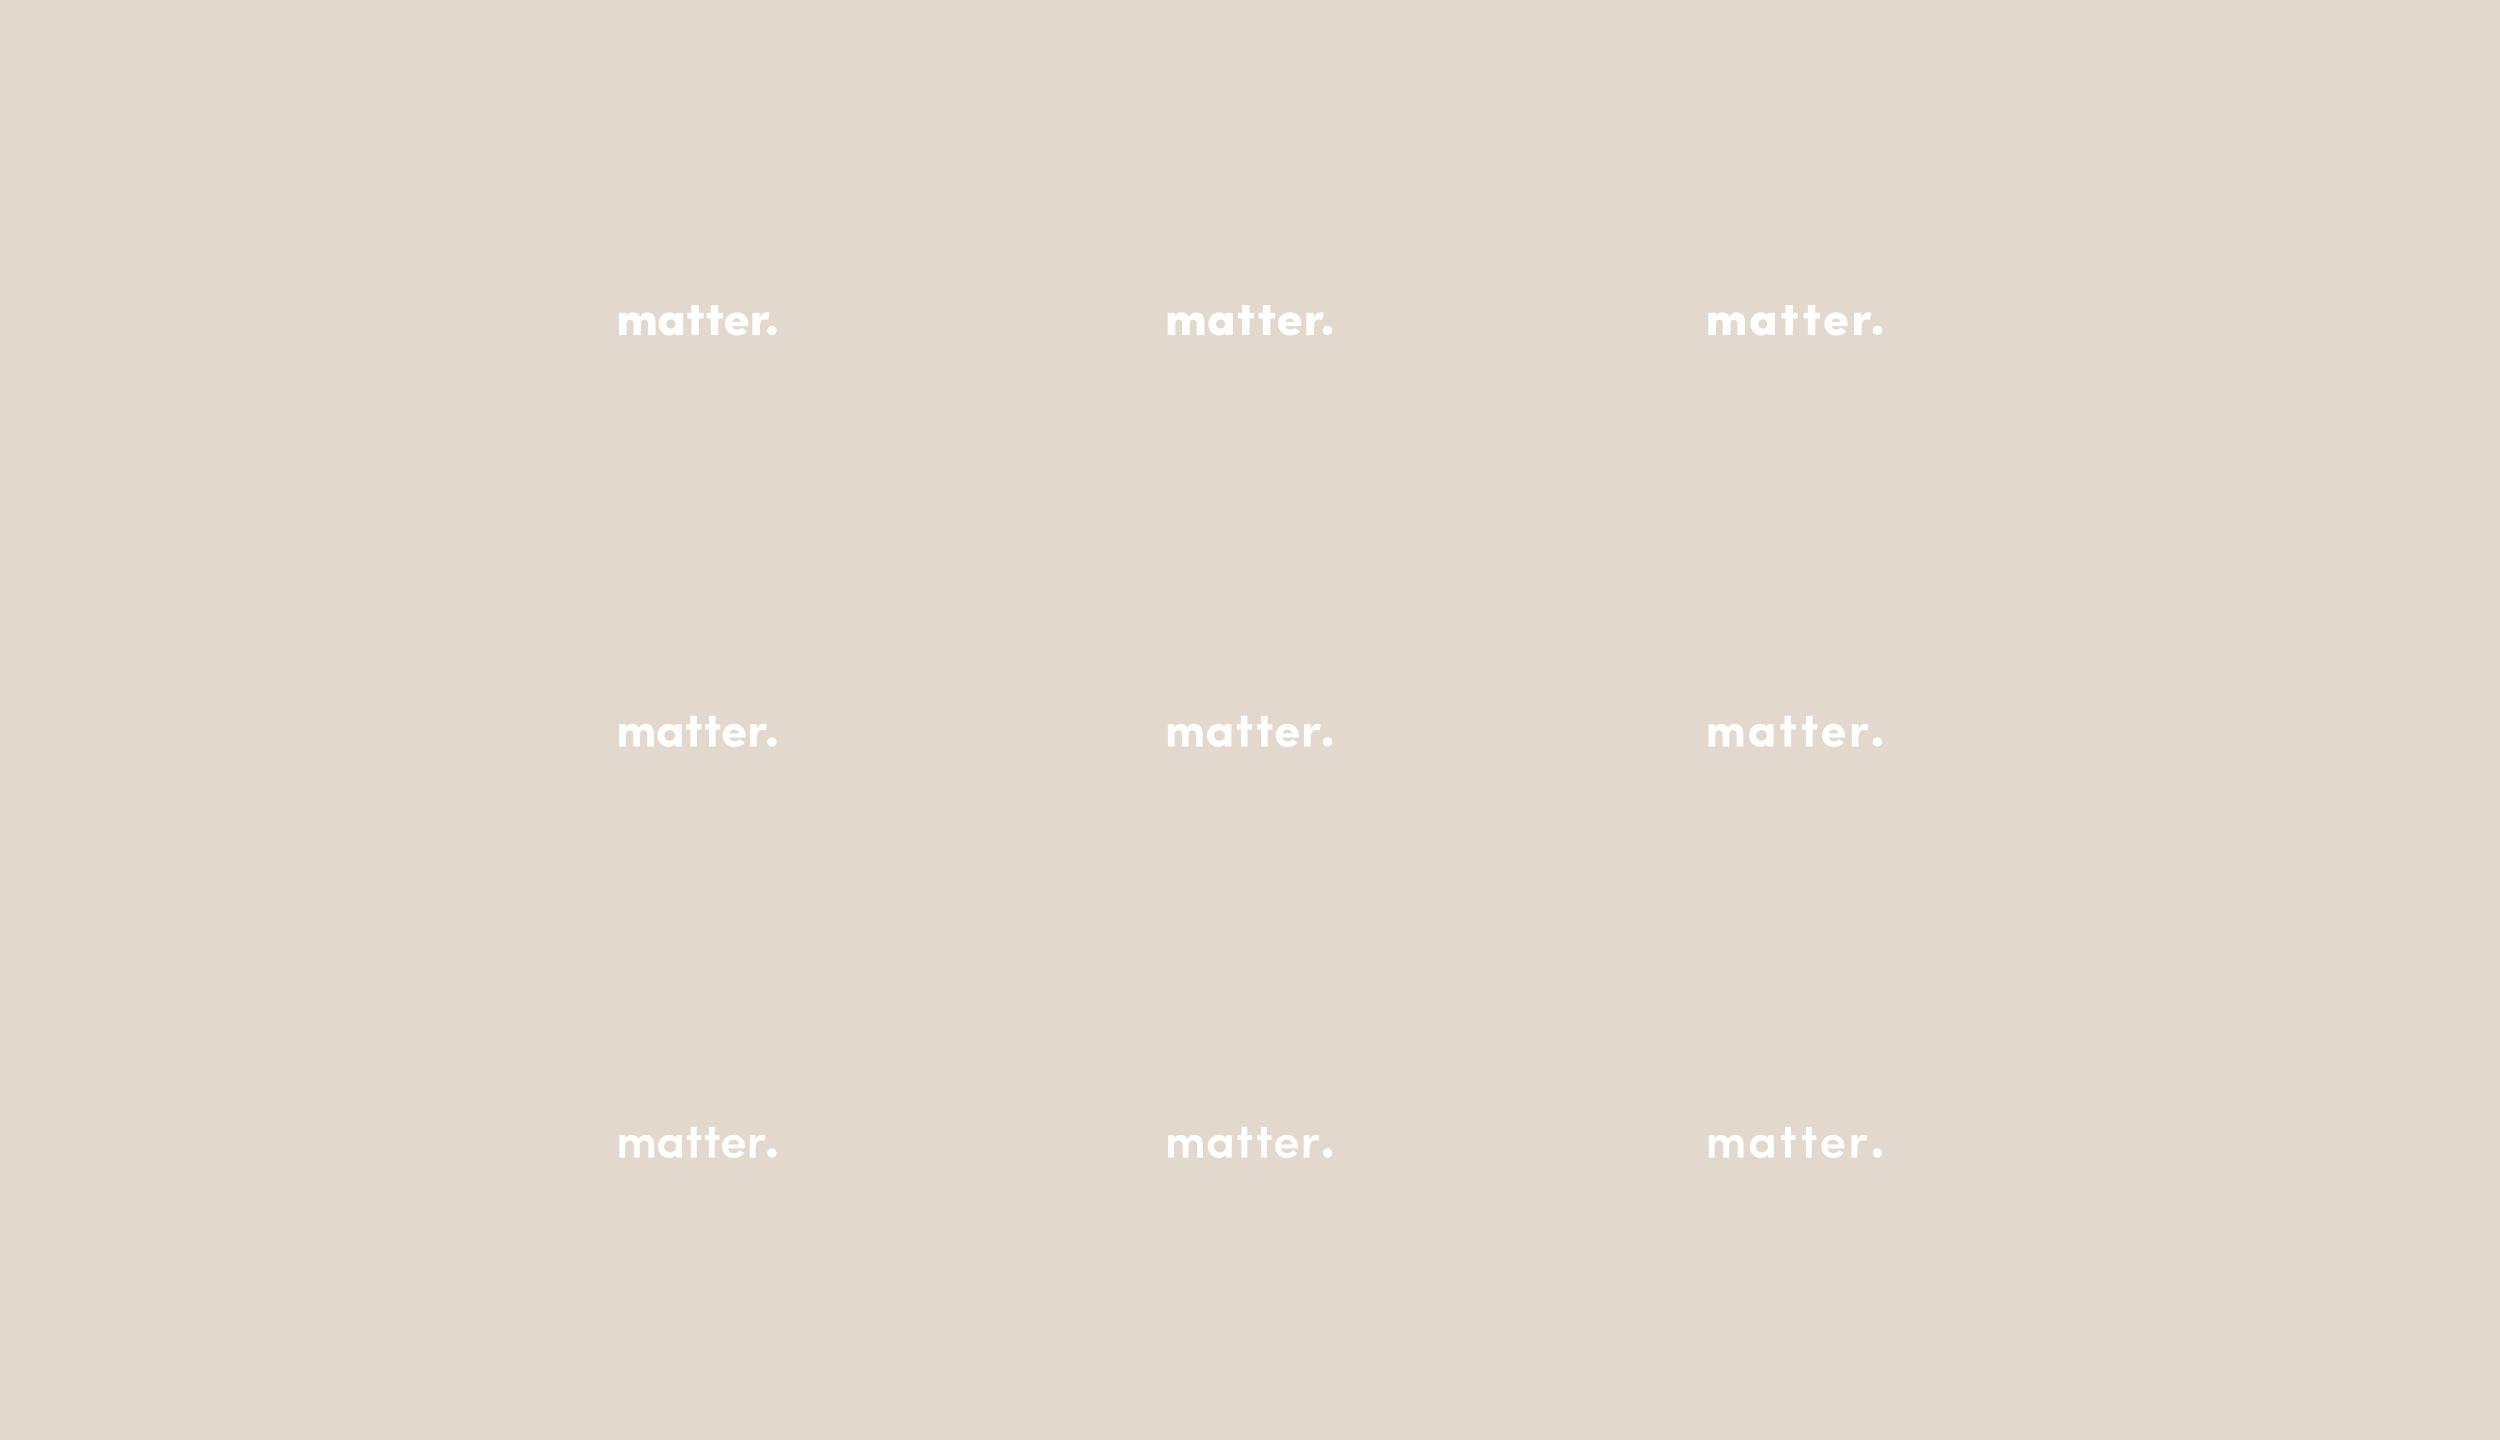 matter-logo-9up.png